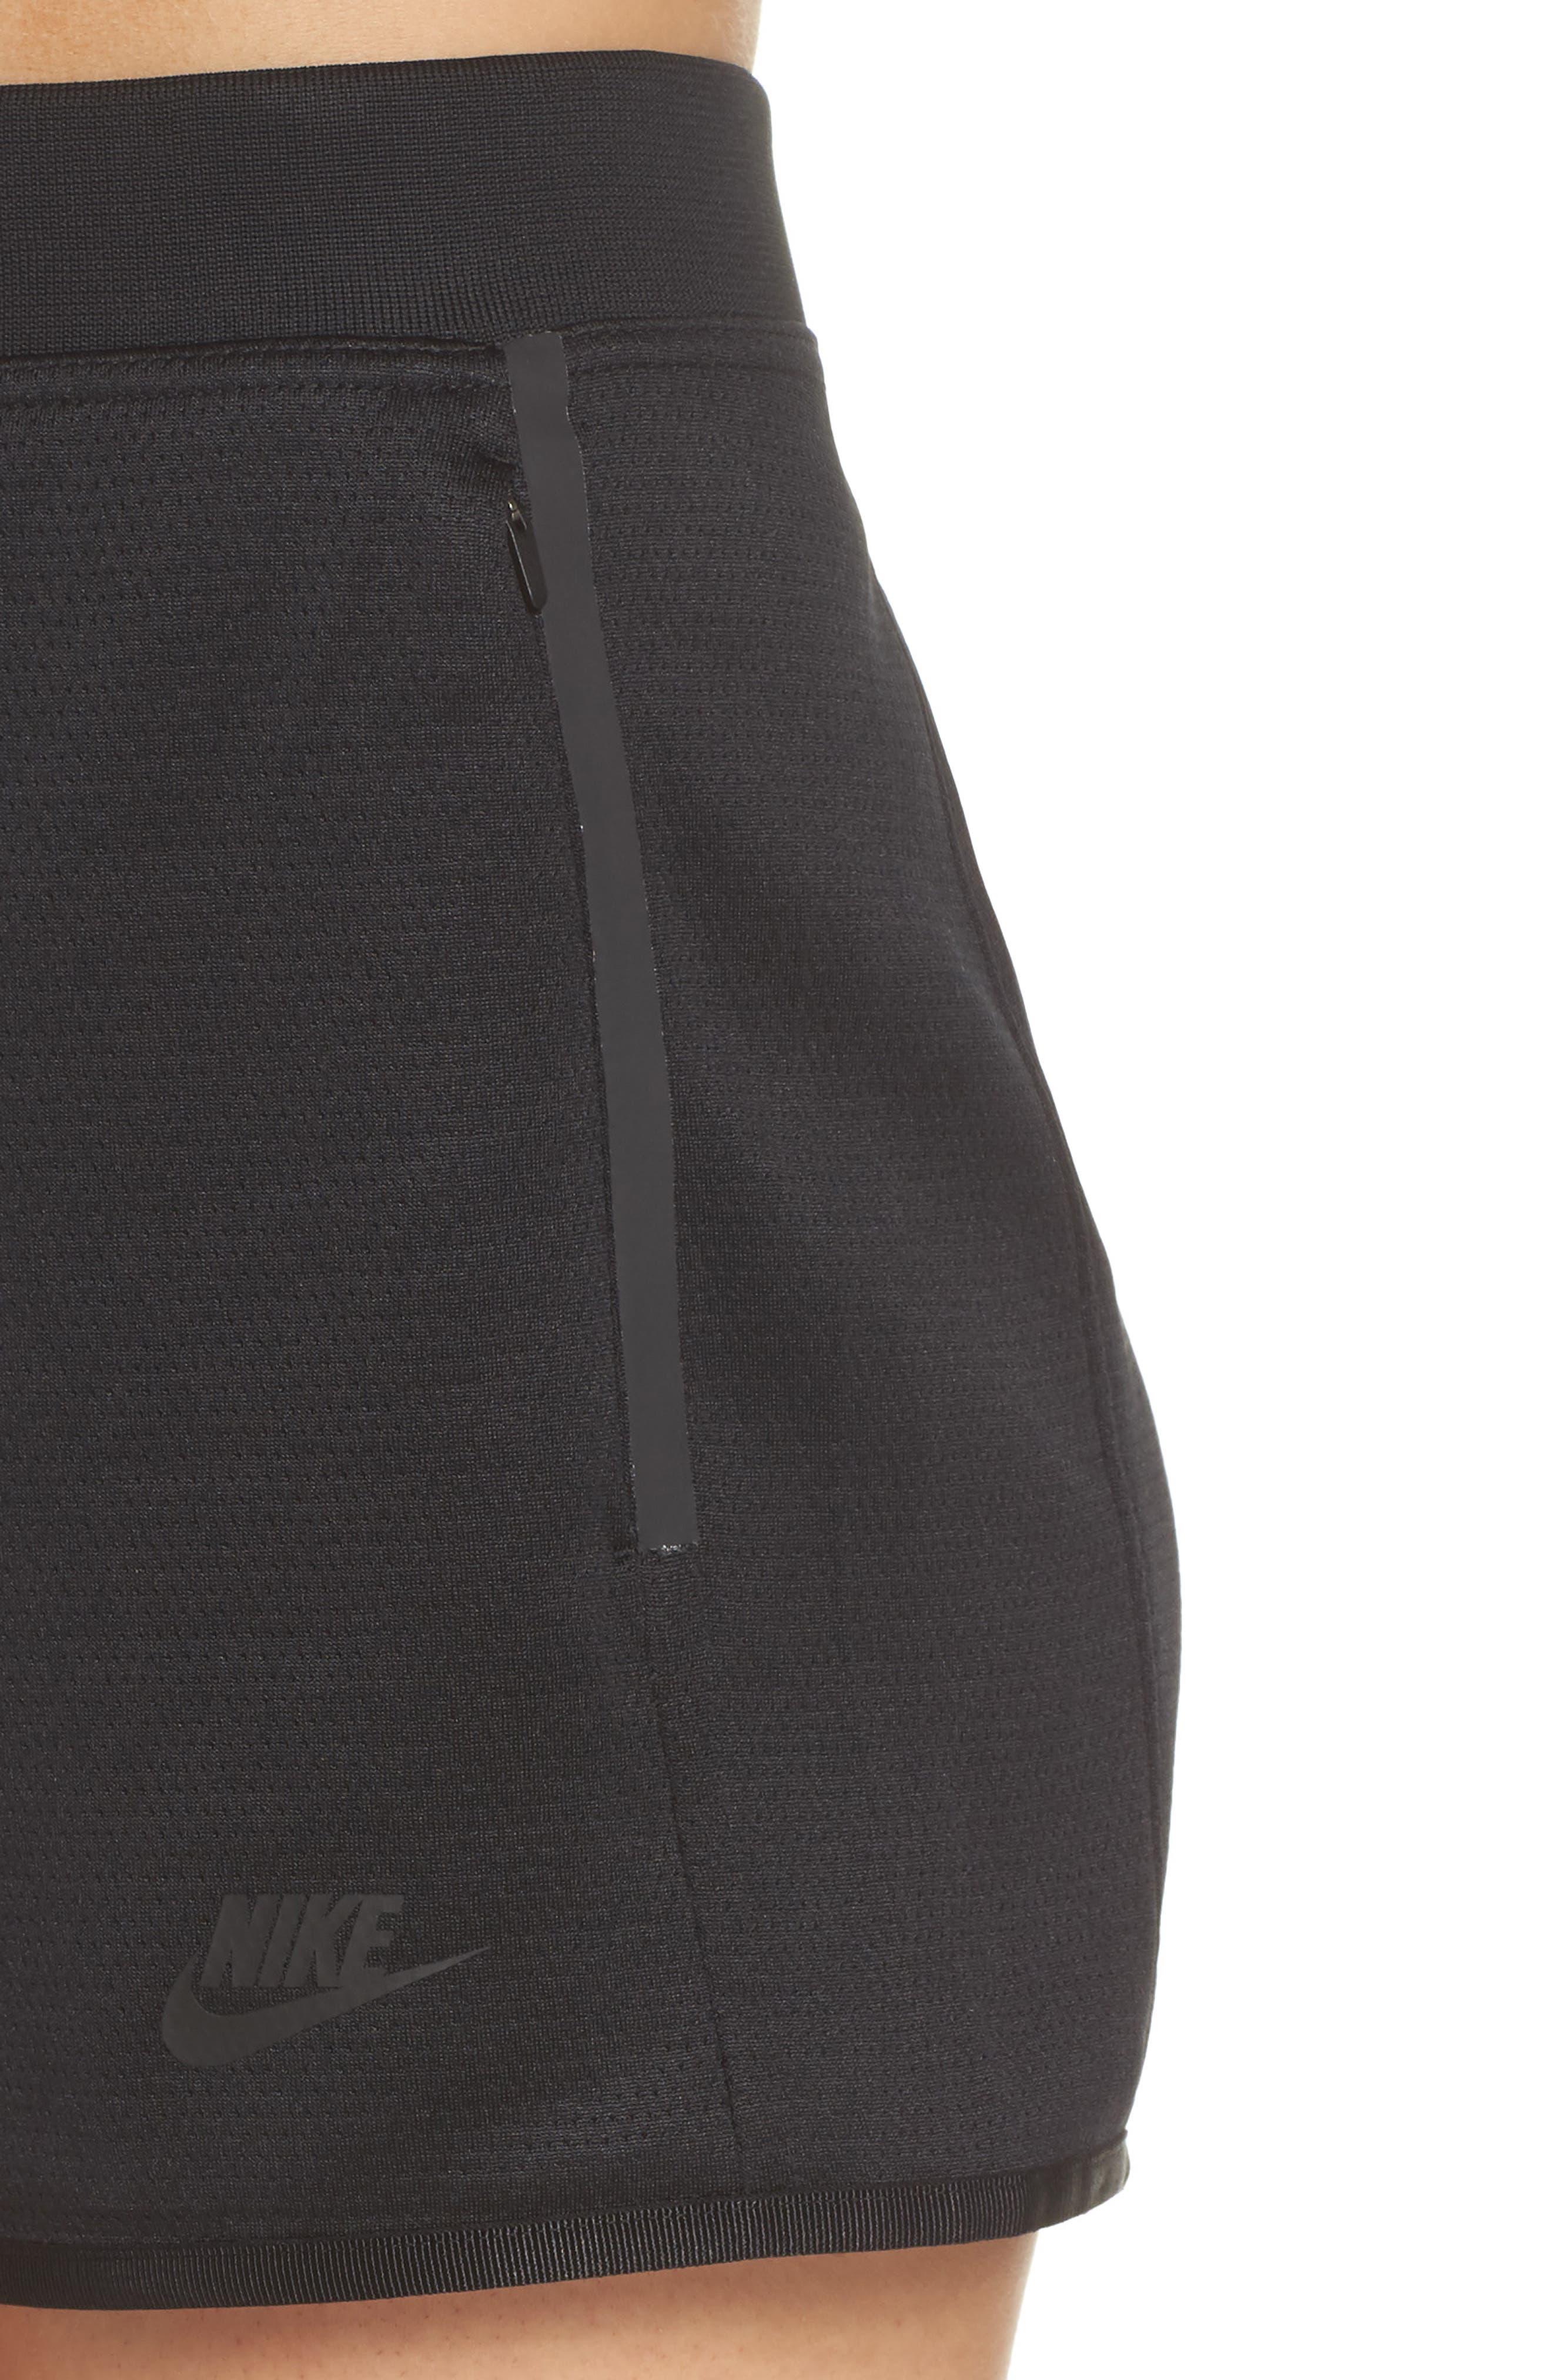 Sportswear Tech Fleece Short,                             Alternate thumbnail 4, color,                             Black/ Black